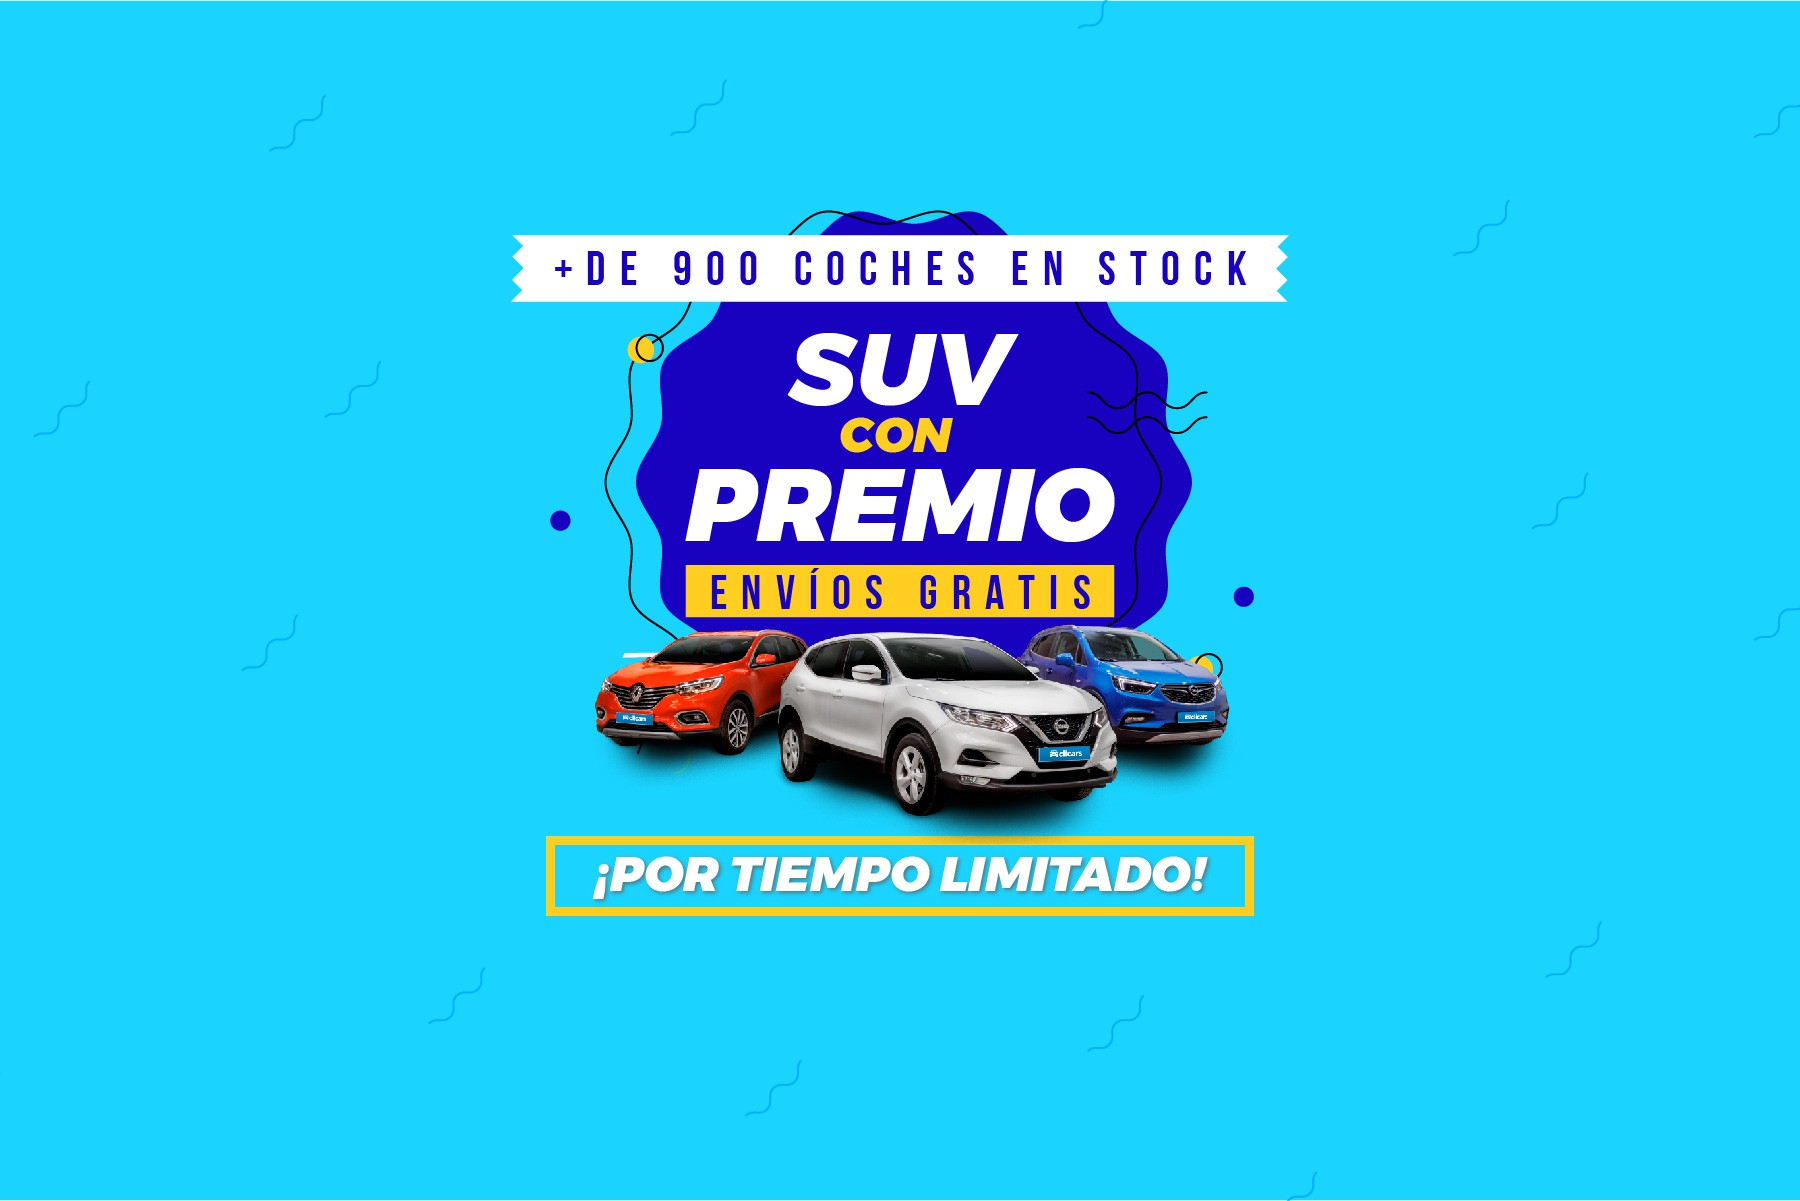 SEAT Arona Gasolina 1.0 TSI 85kW Xcellence Edition Eco 2